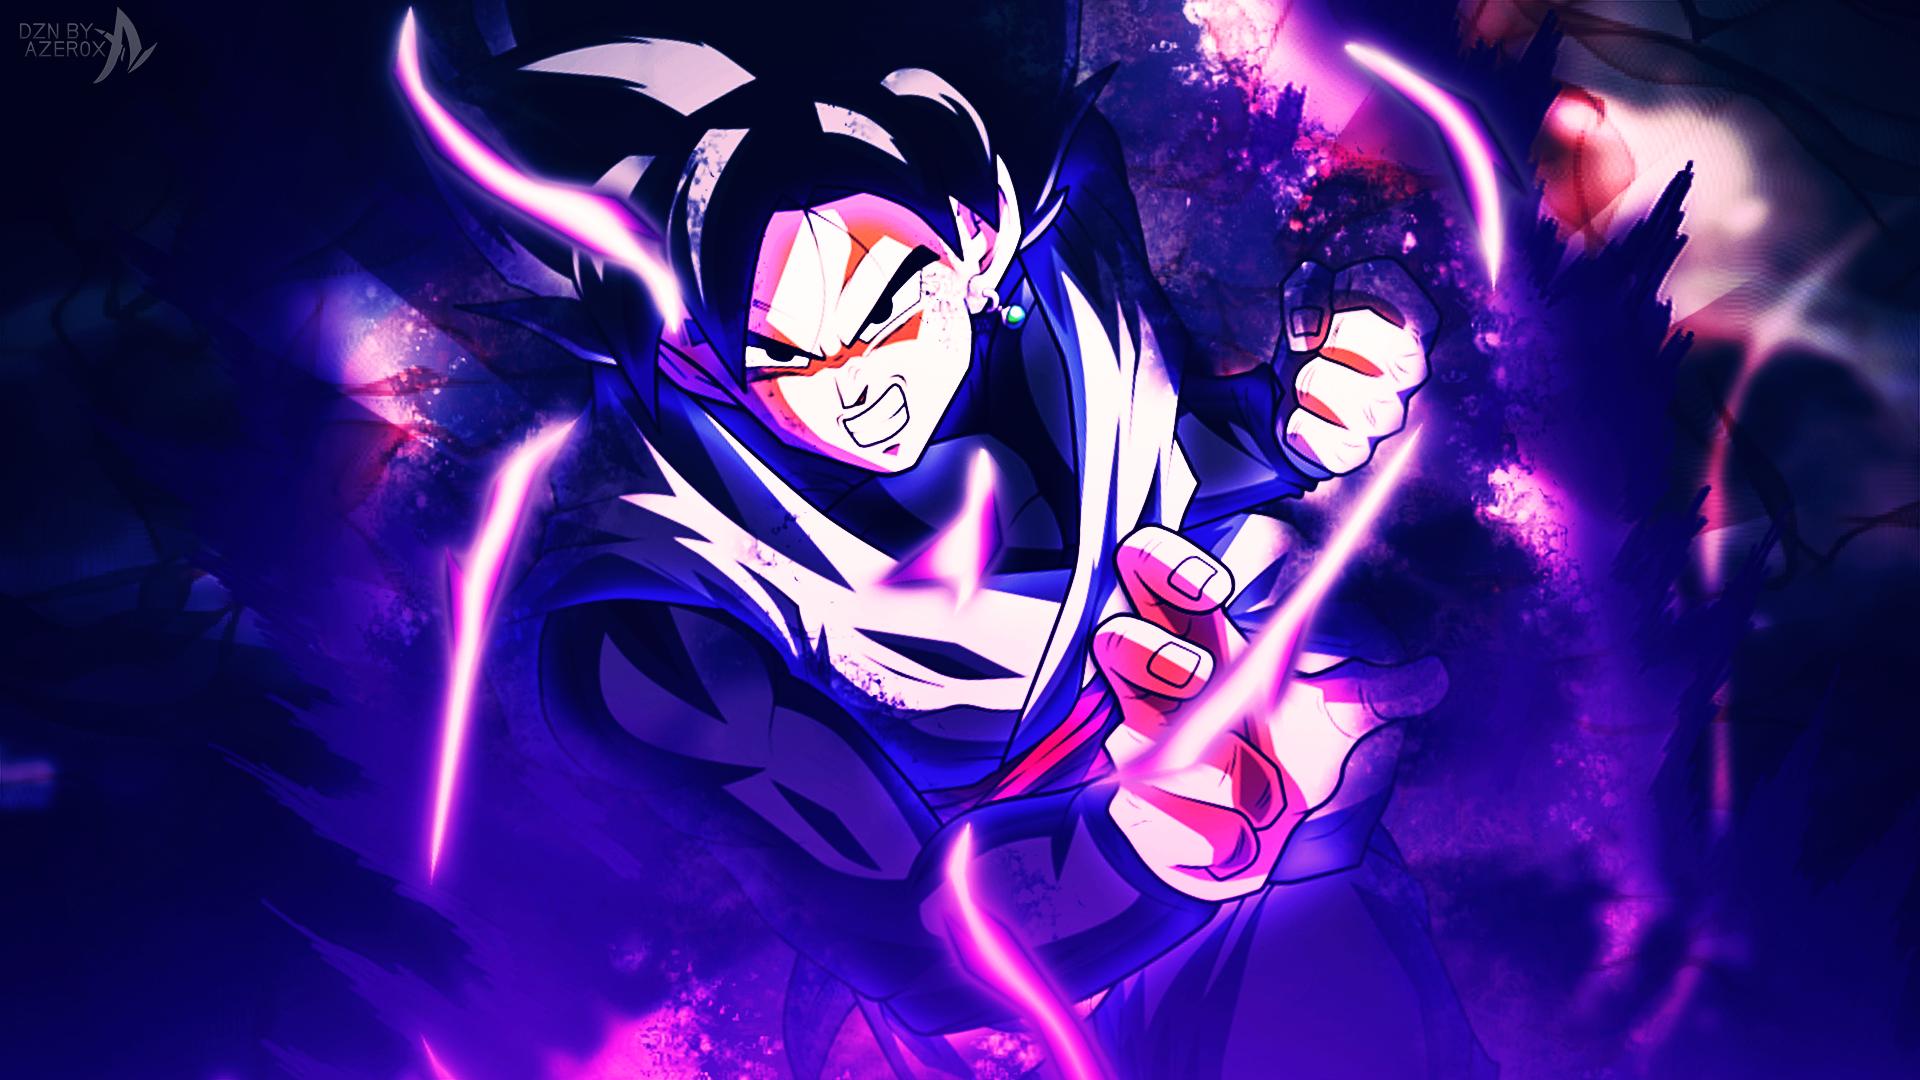 Wallpaper Dragon Ball Super Akira Toriyama Black Goku Dragon